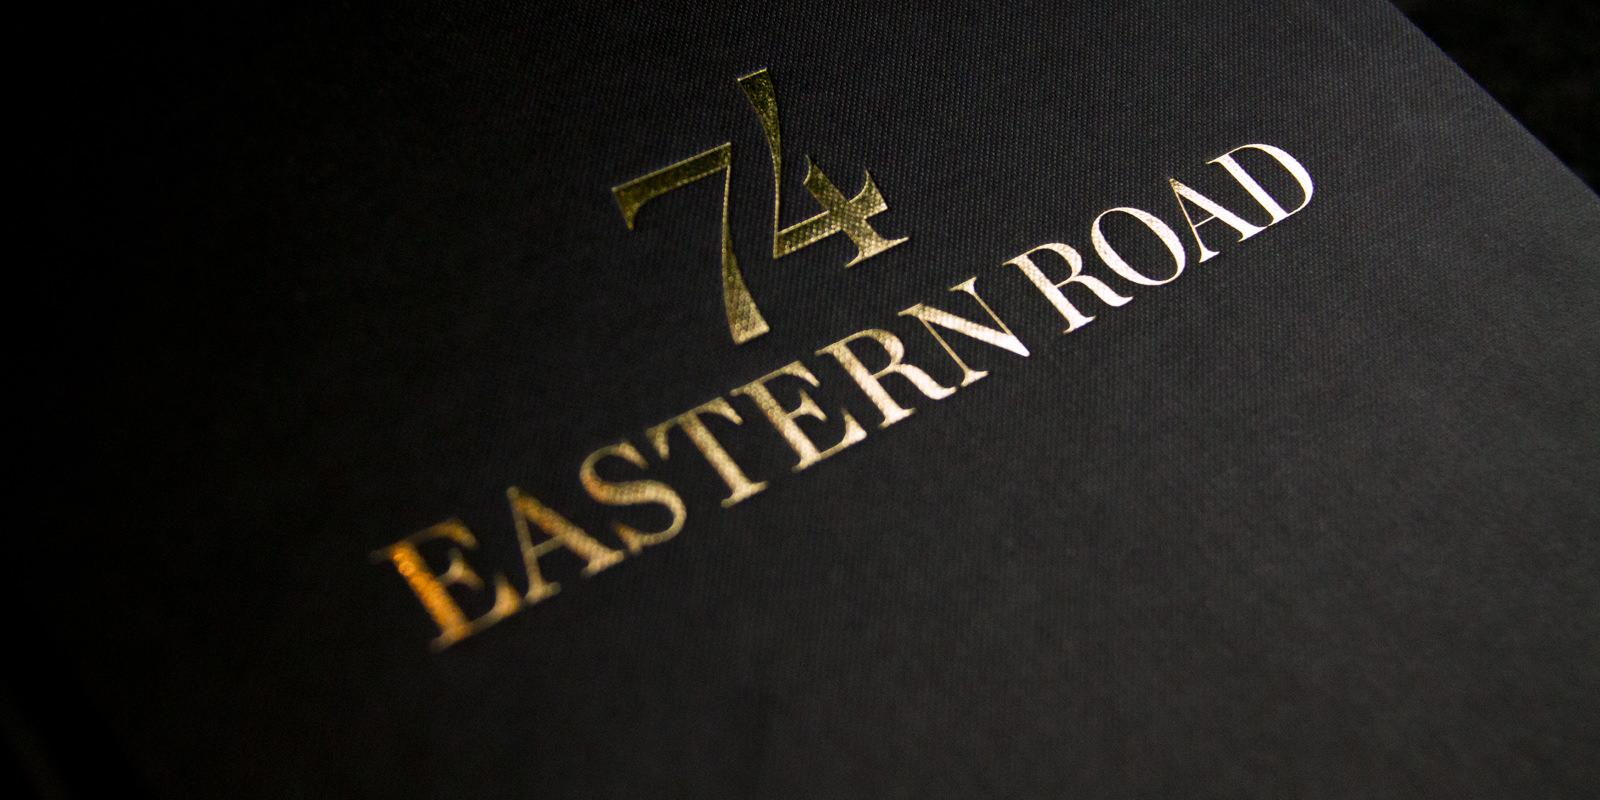 74 Eastern Rd